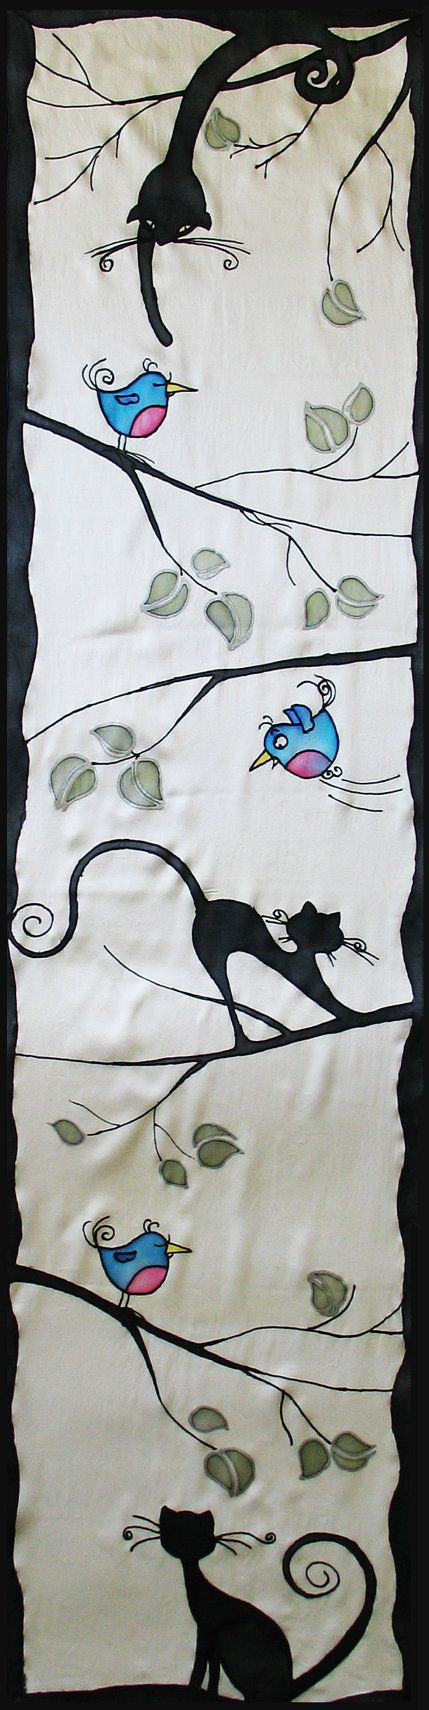 Silk scarf handpainted cat and bird silk batik shawl by LIAKURZ